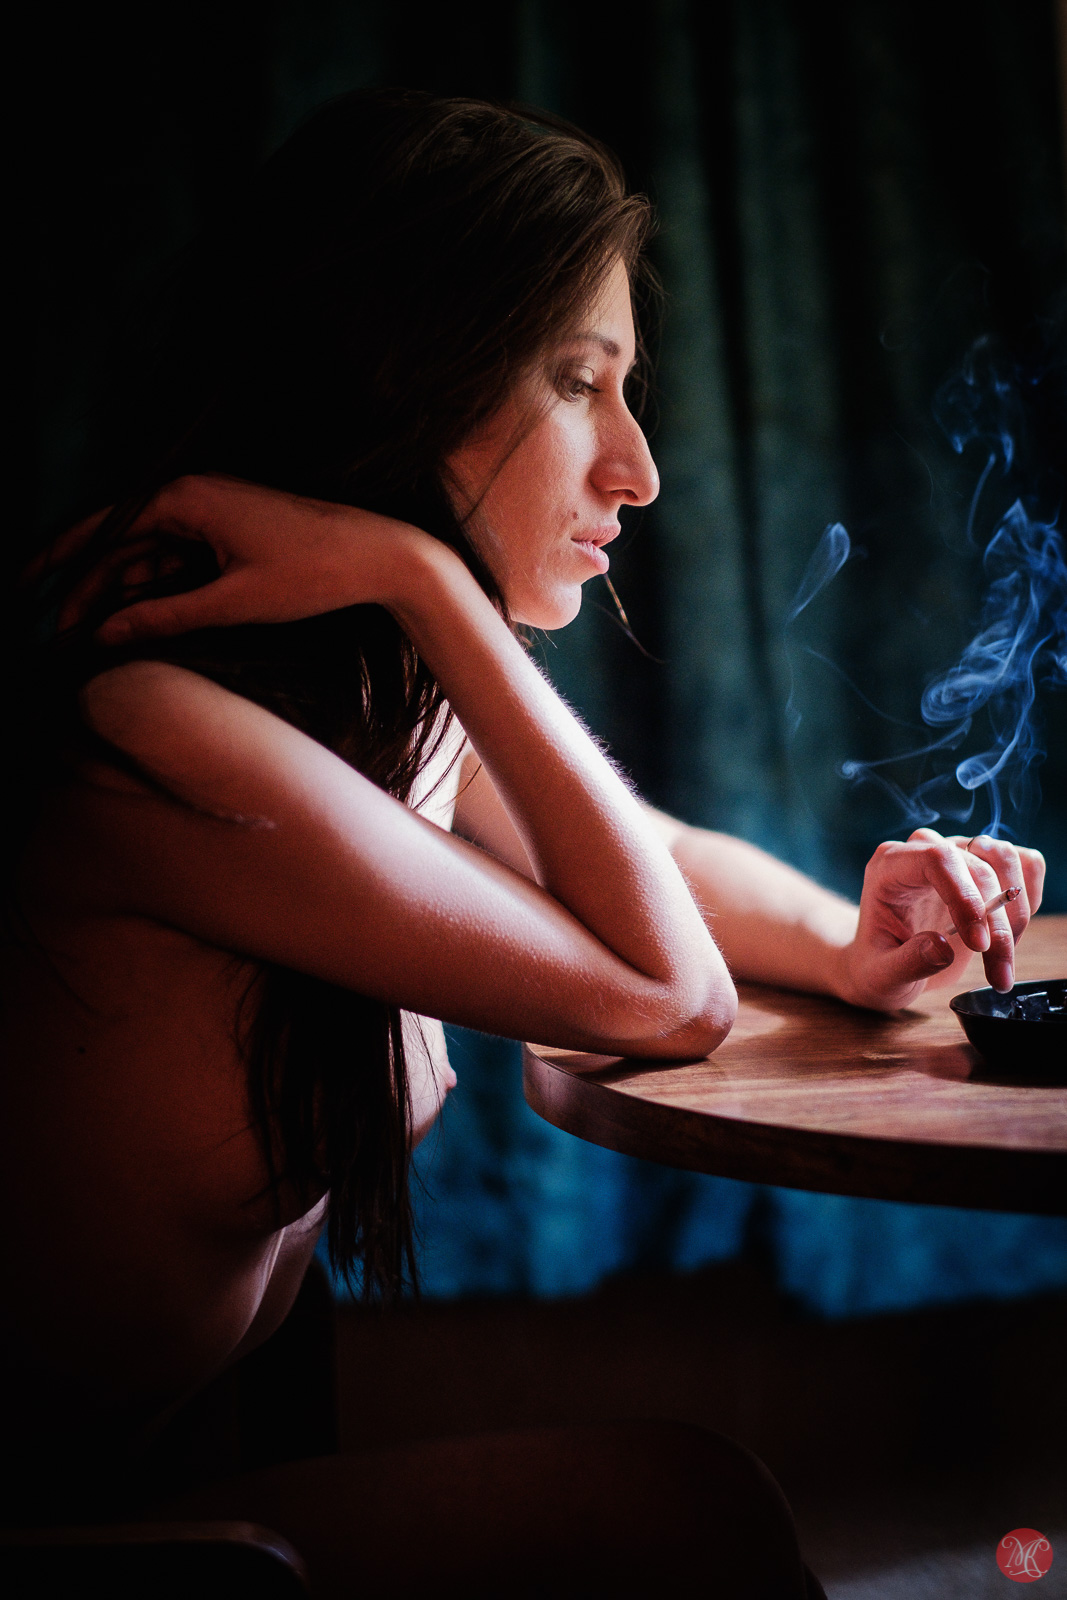 Kate Snig model woman portrait smoking nude